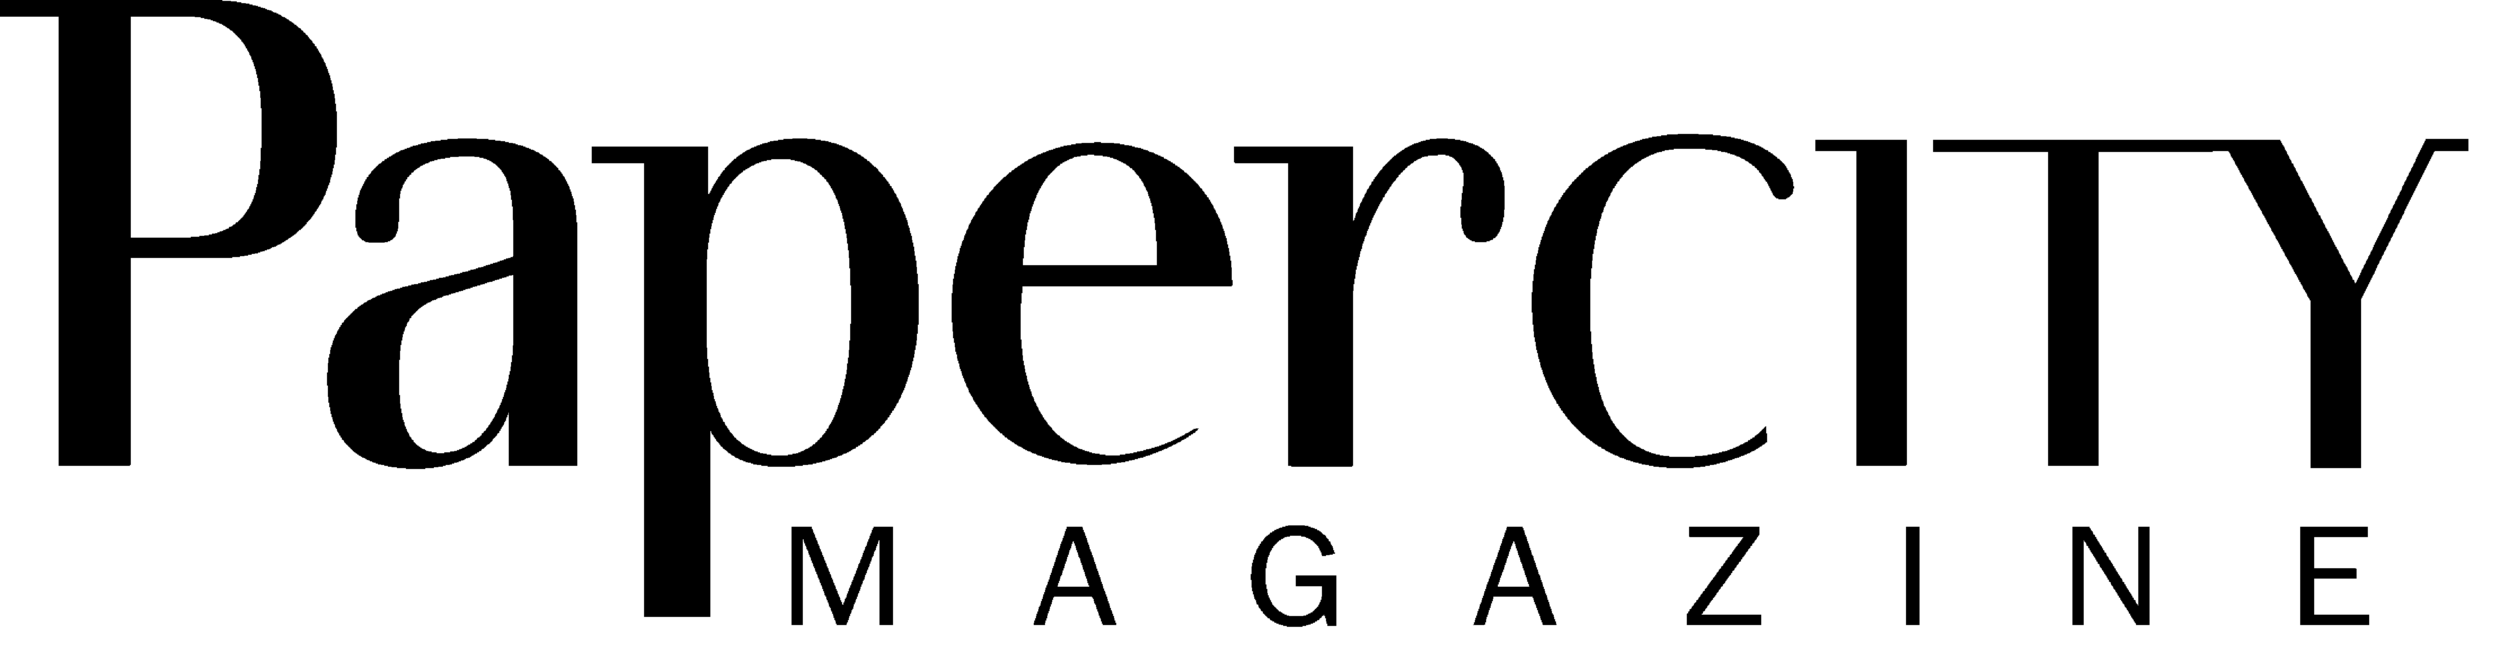 papercity-magazine-black.png